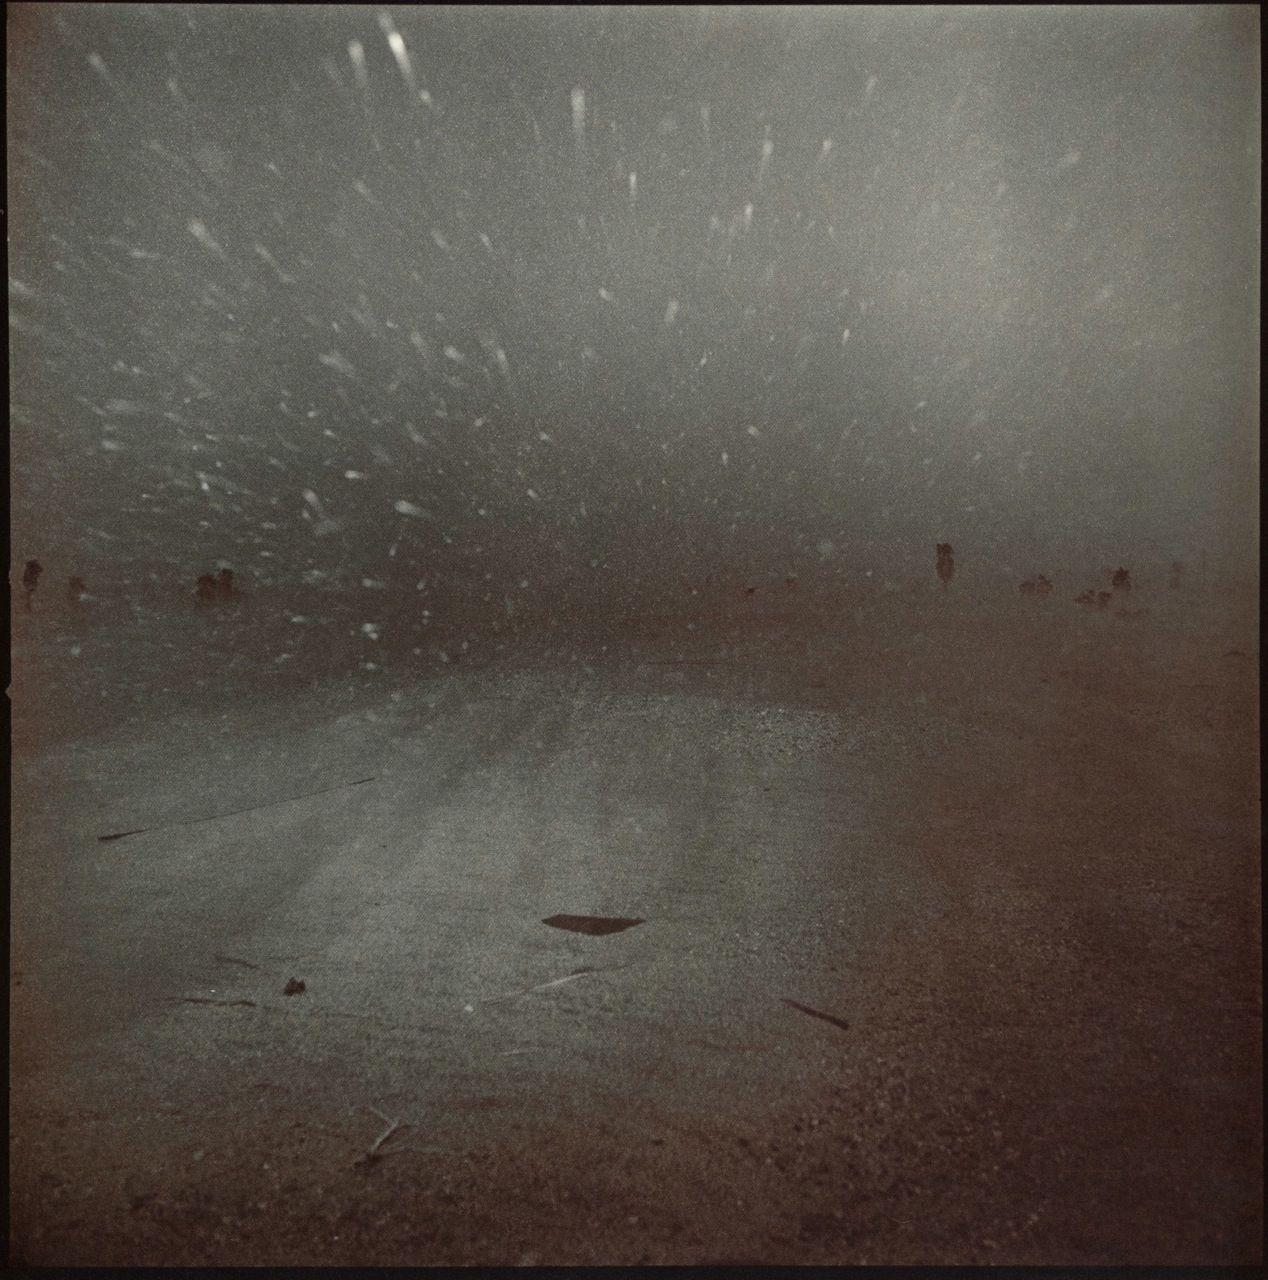 Richard Misrach, Untitled (Sandstorm), (1976)